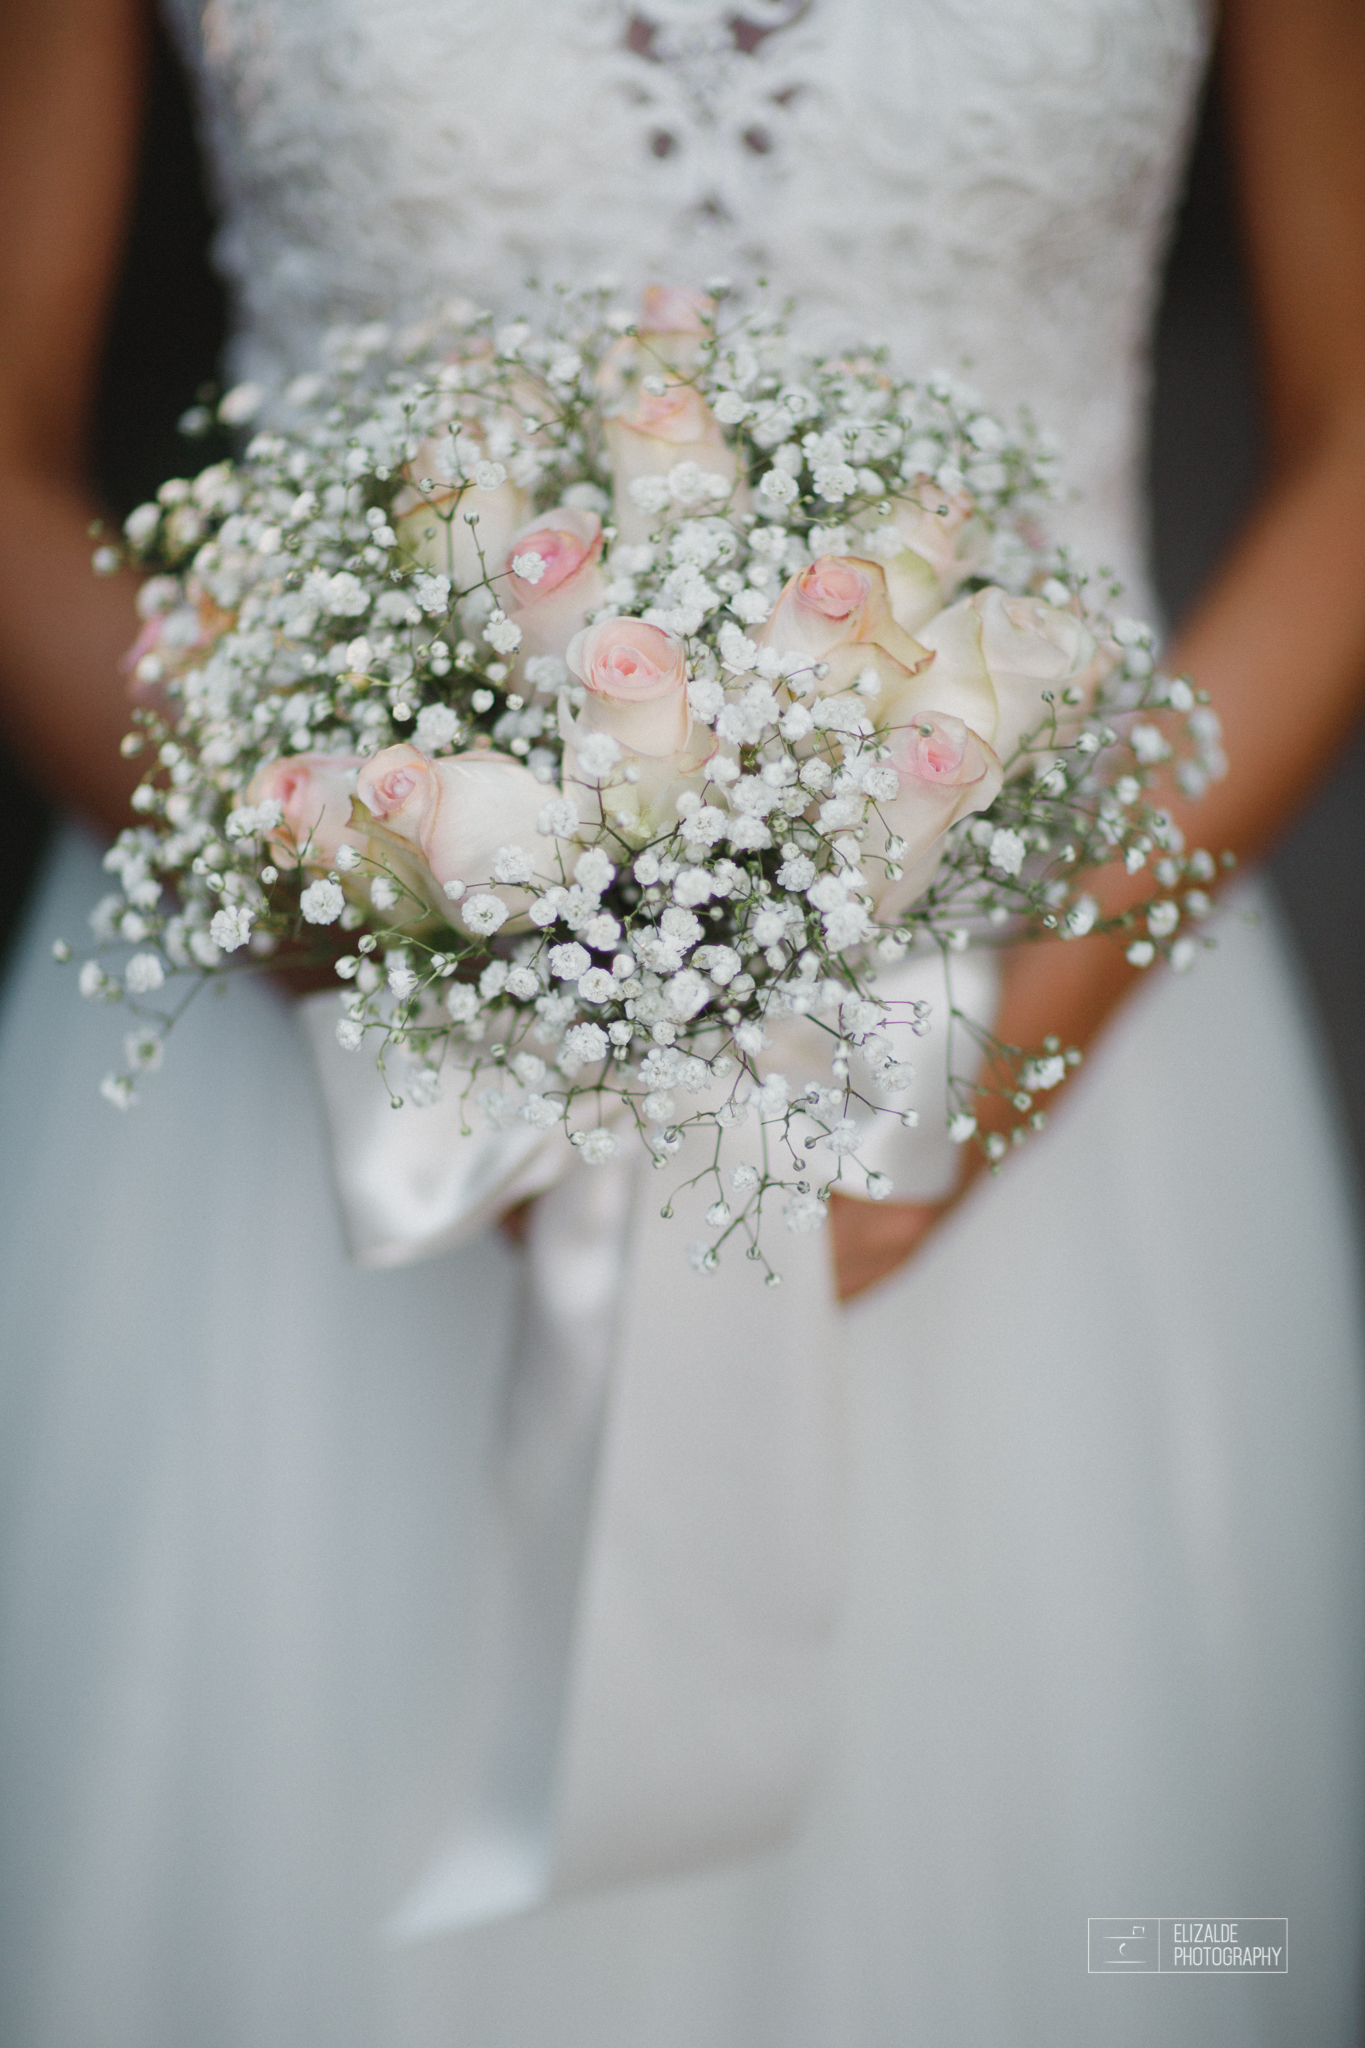 Bridal session_Dallas Photographer_Elizalde Photography_Denton photographer_ DFW Photographer_ Wedding Photographer_Baleigh4.jpg